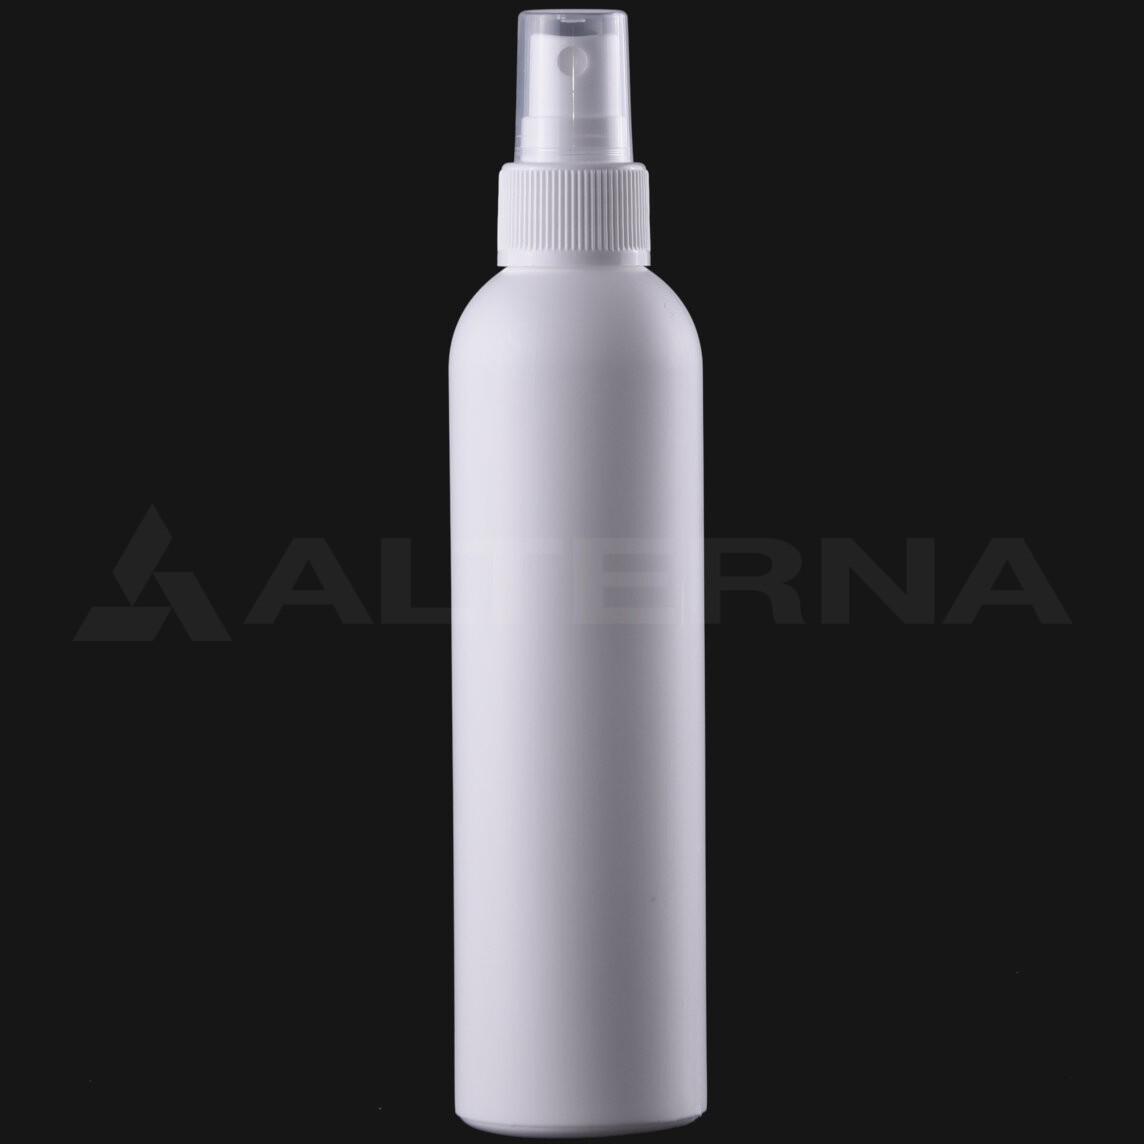 200 ml HDPE Bottle with 24 mm Sprayer